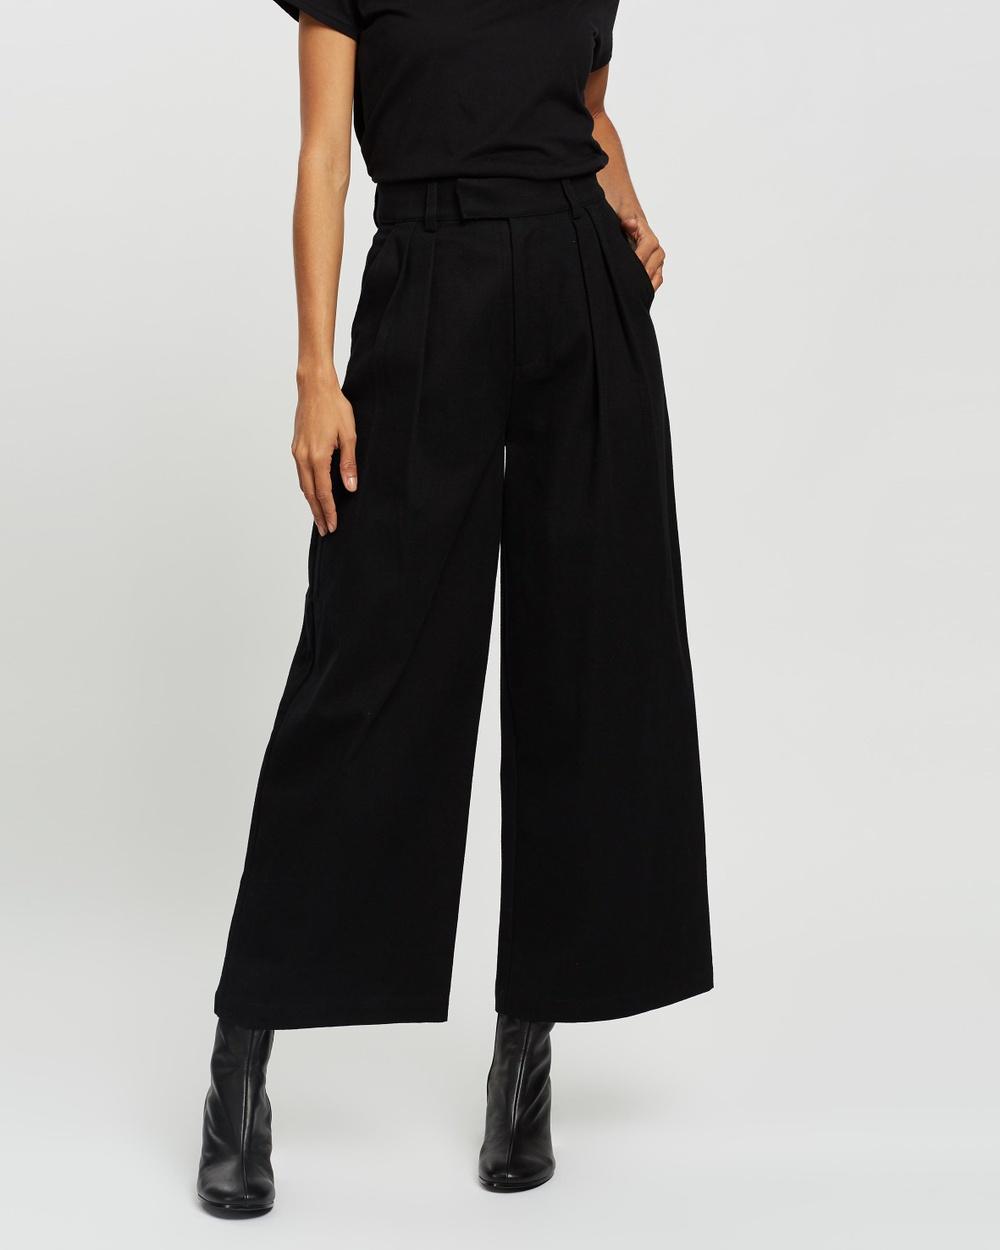 AERE Organic Cotton Wide Leg Pants Black